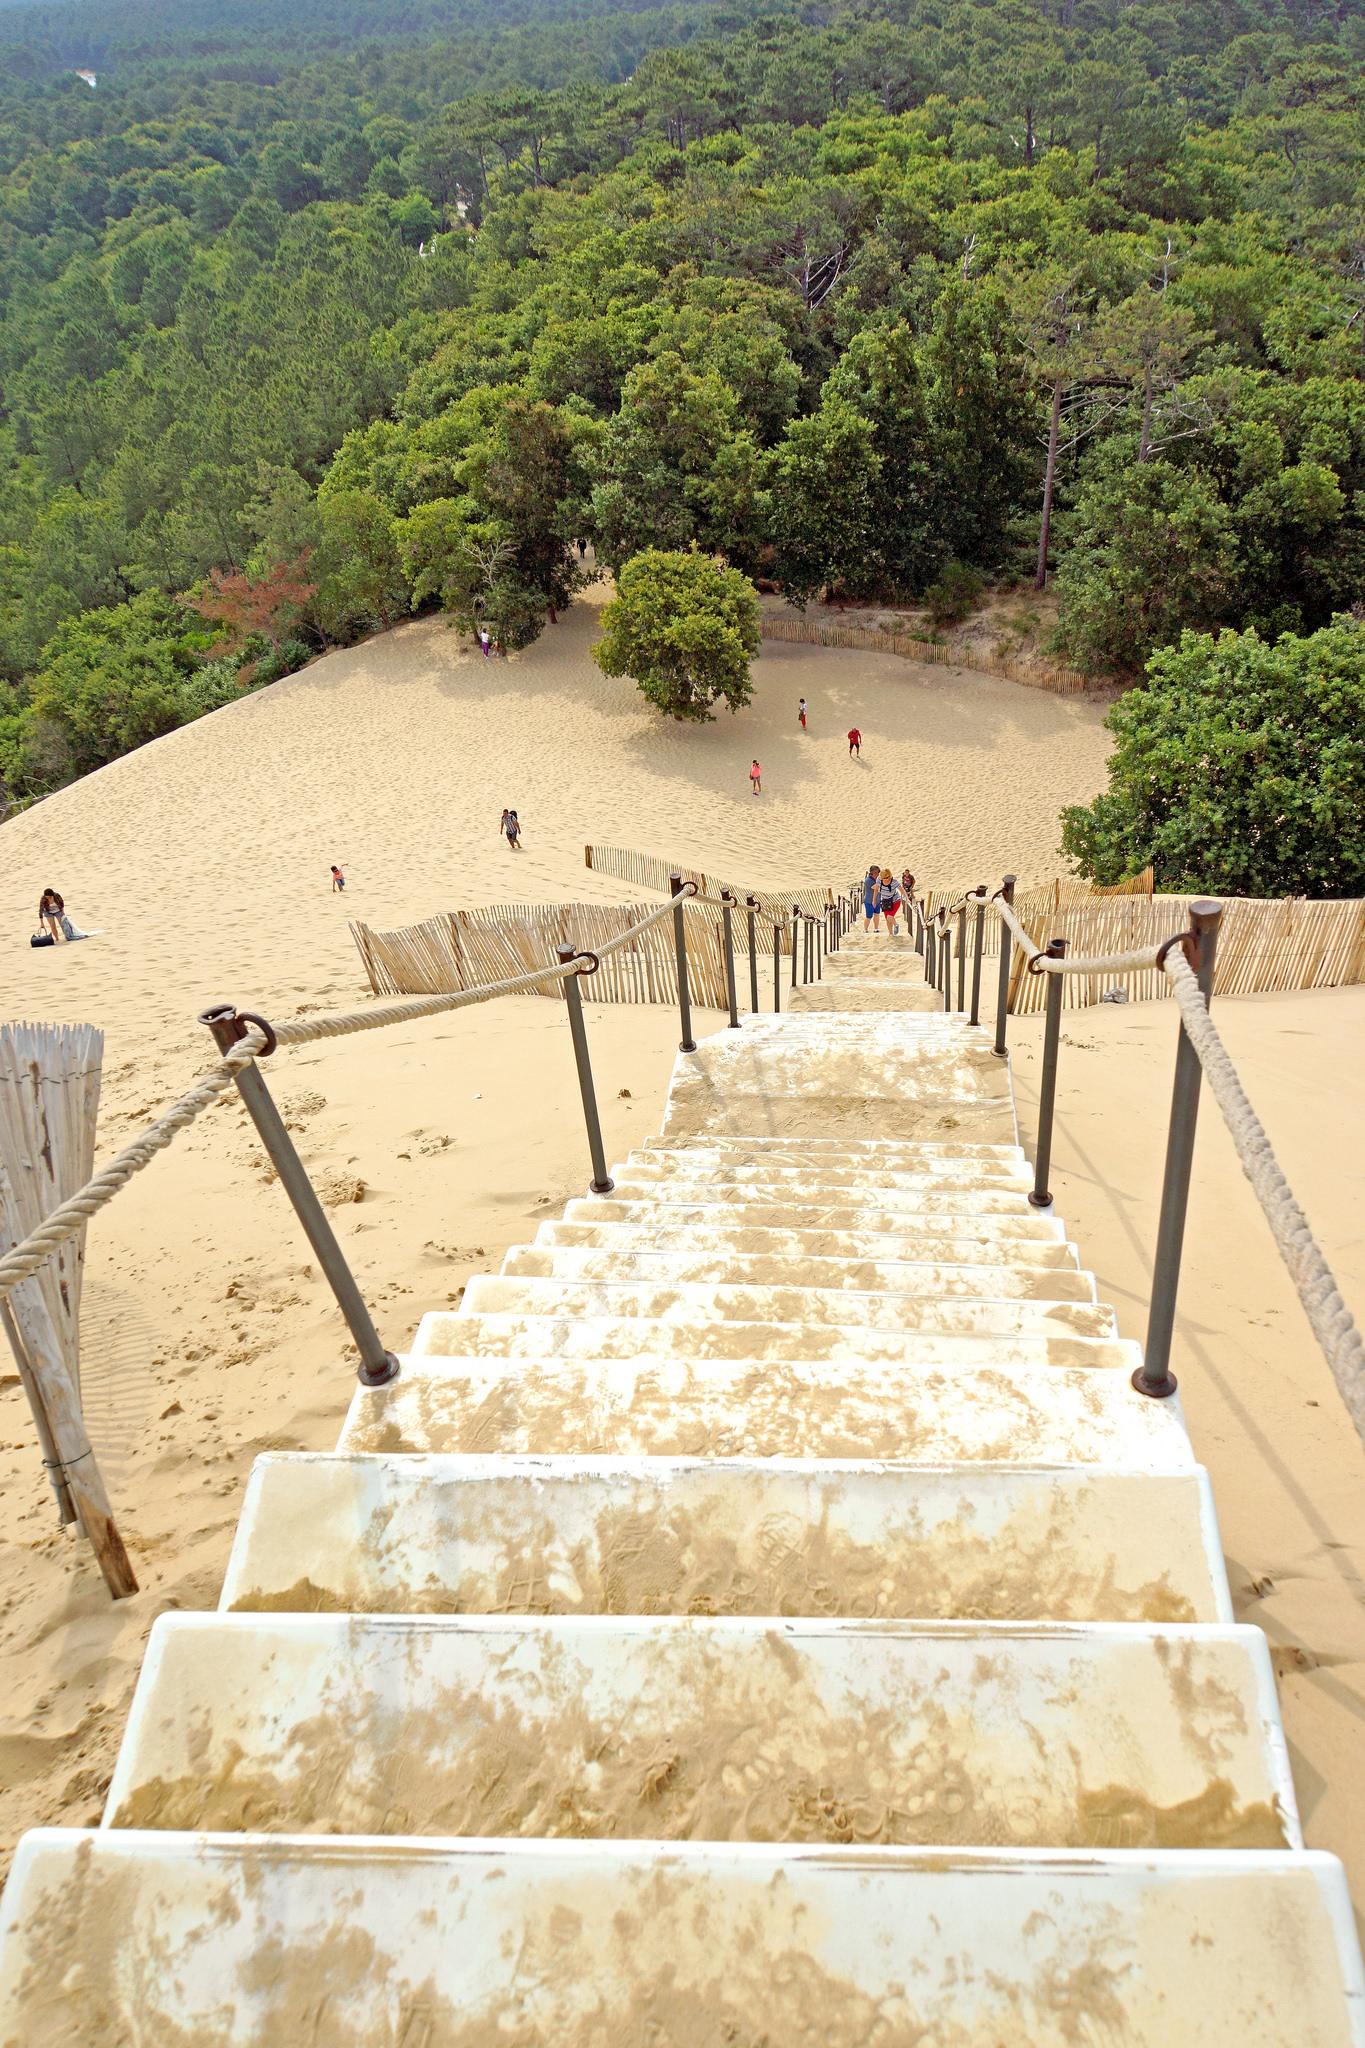 Dune du Pilat, France - Flickr